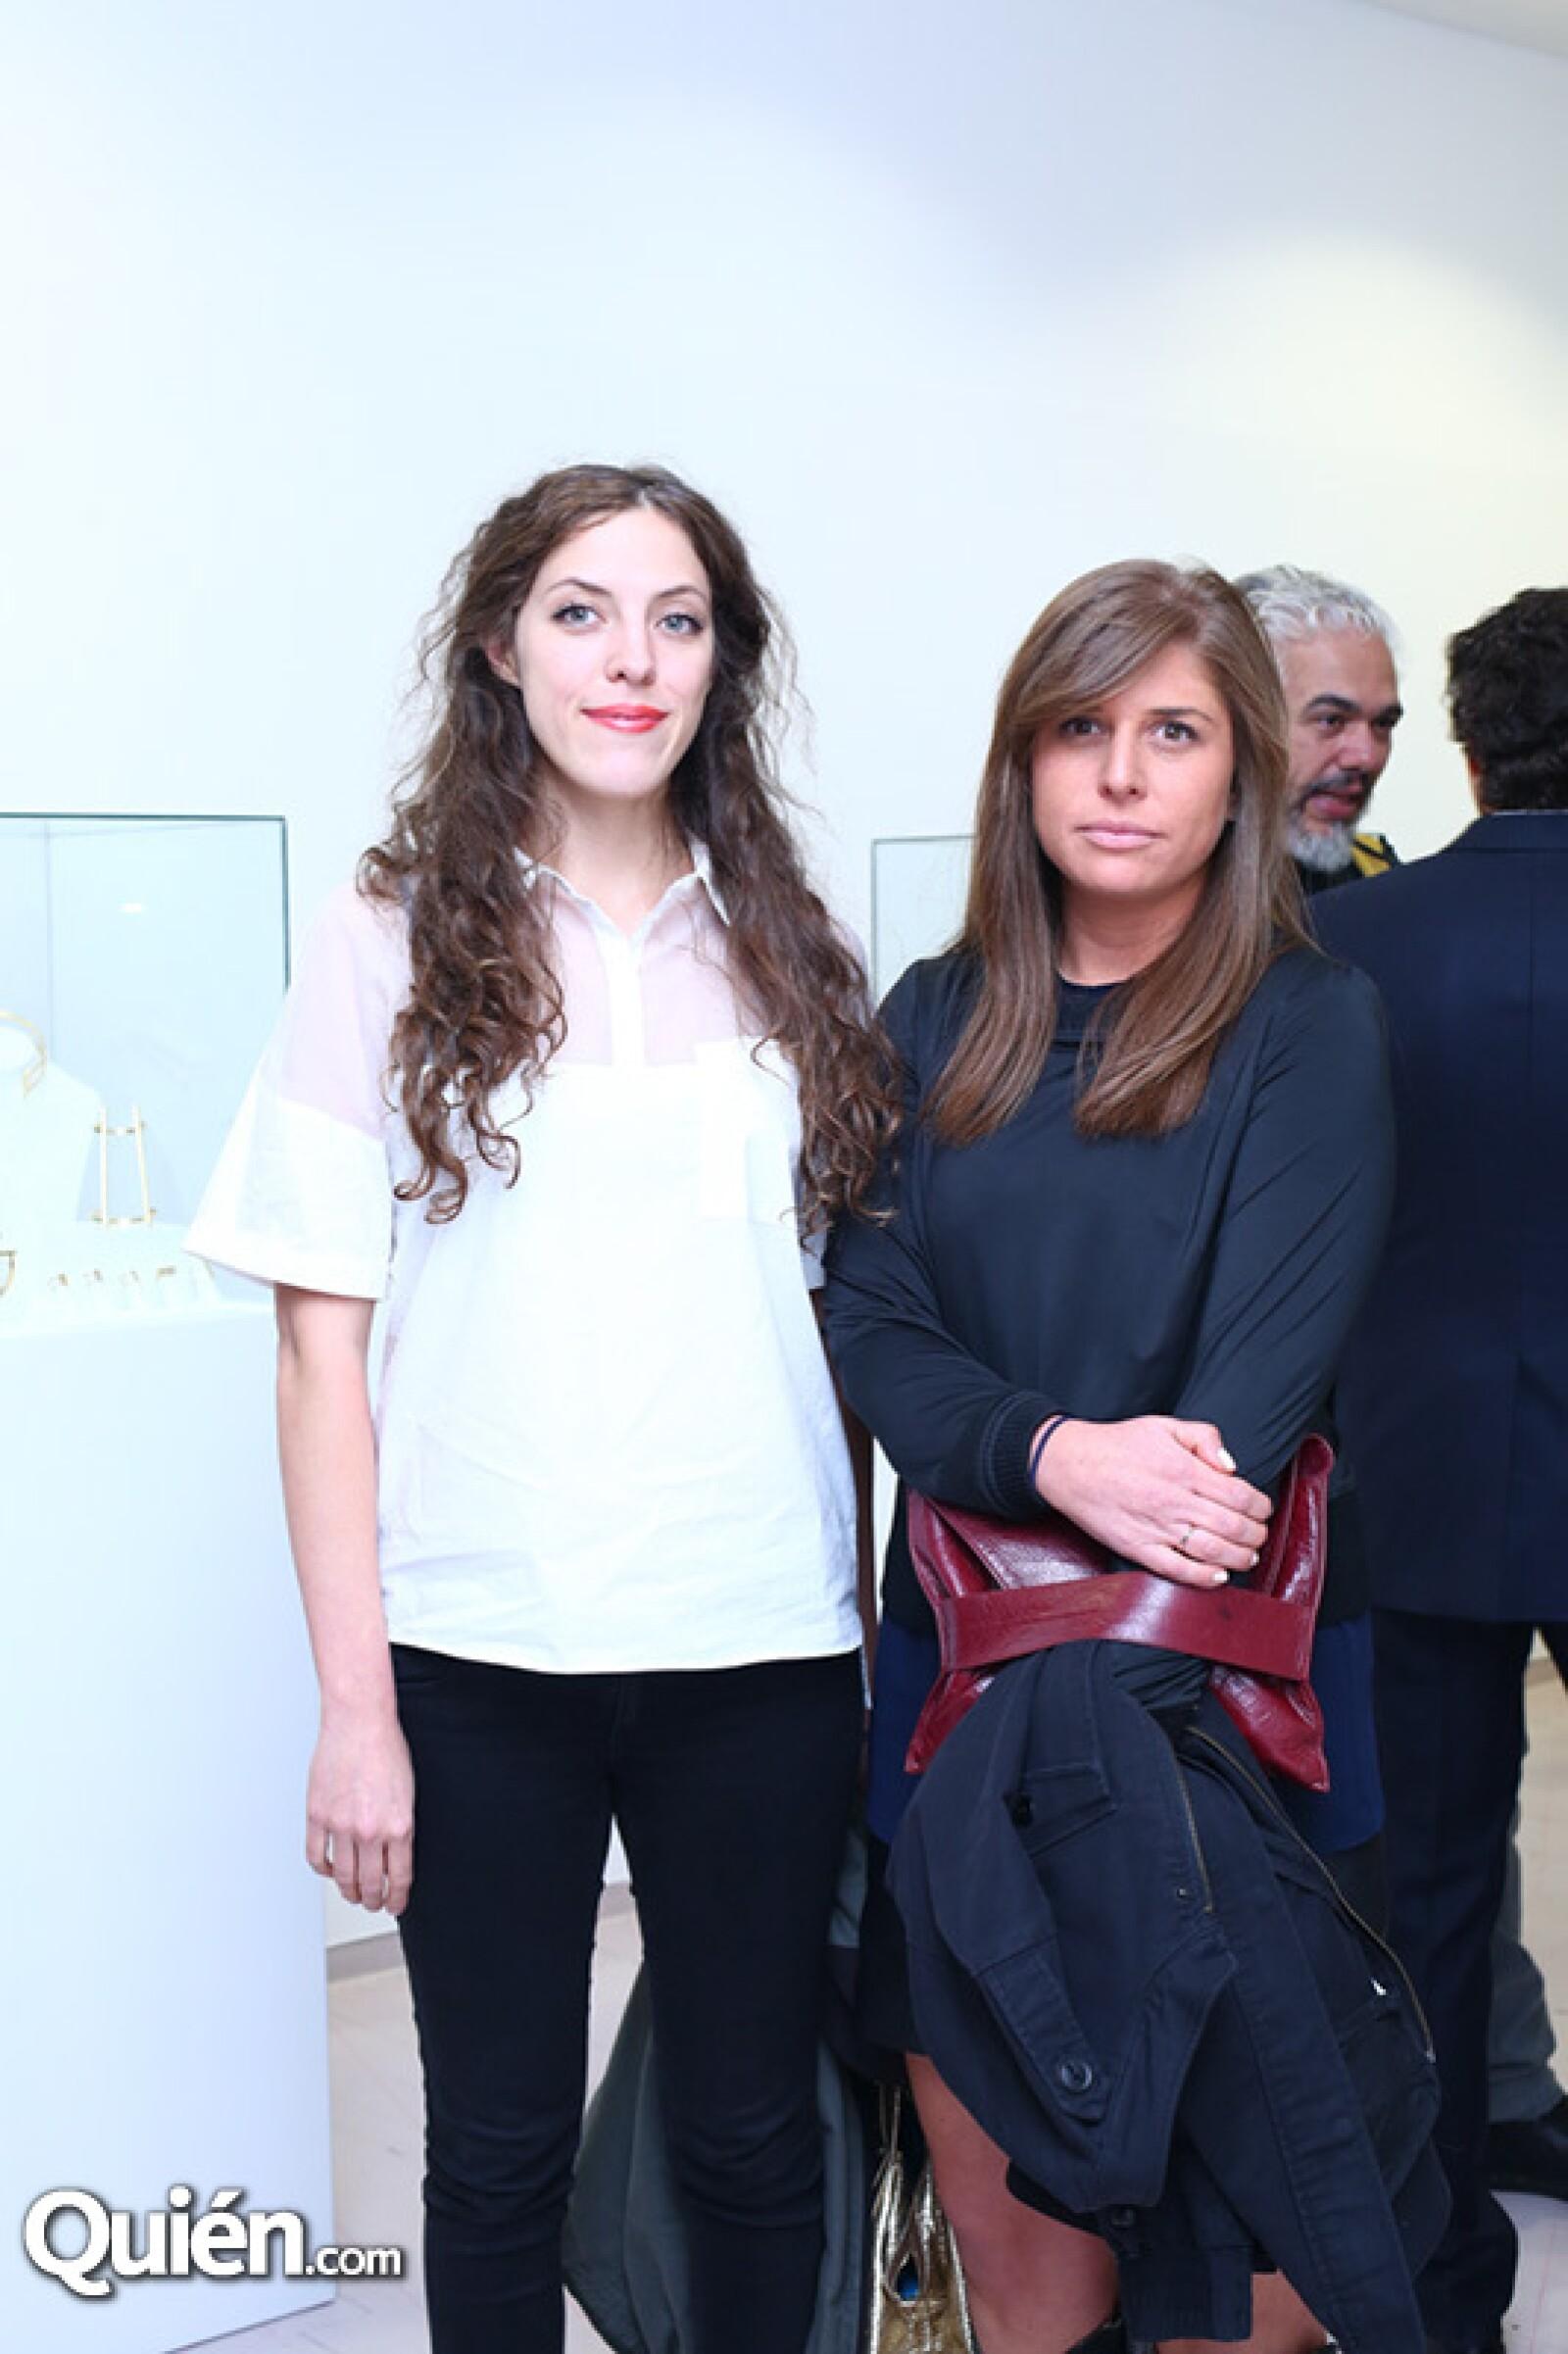 Susana Medina y Lorena Sarabia